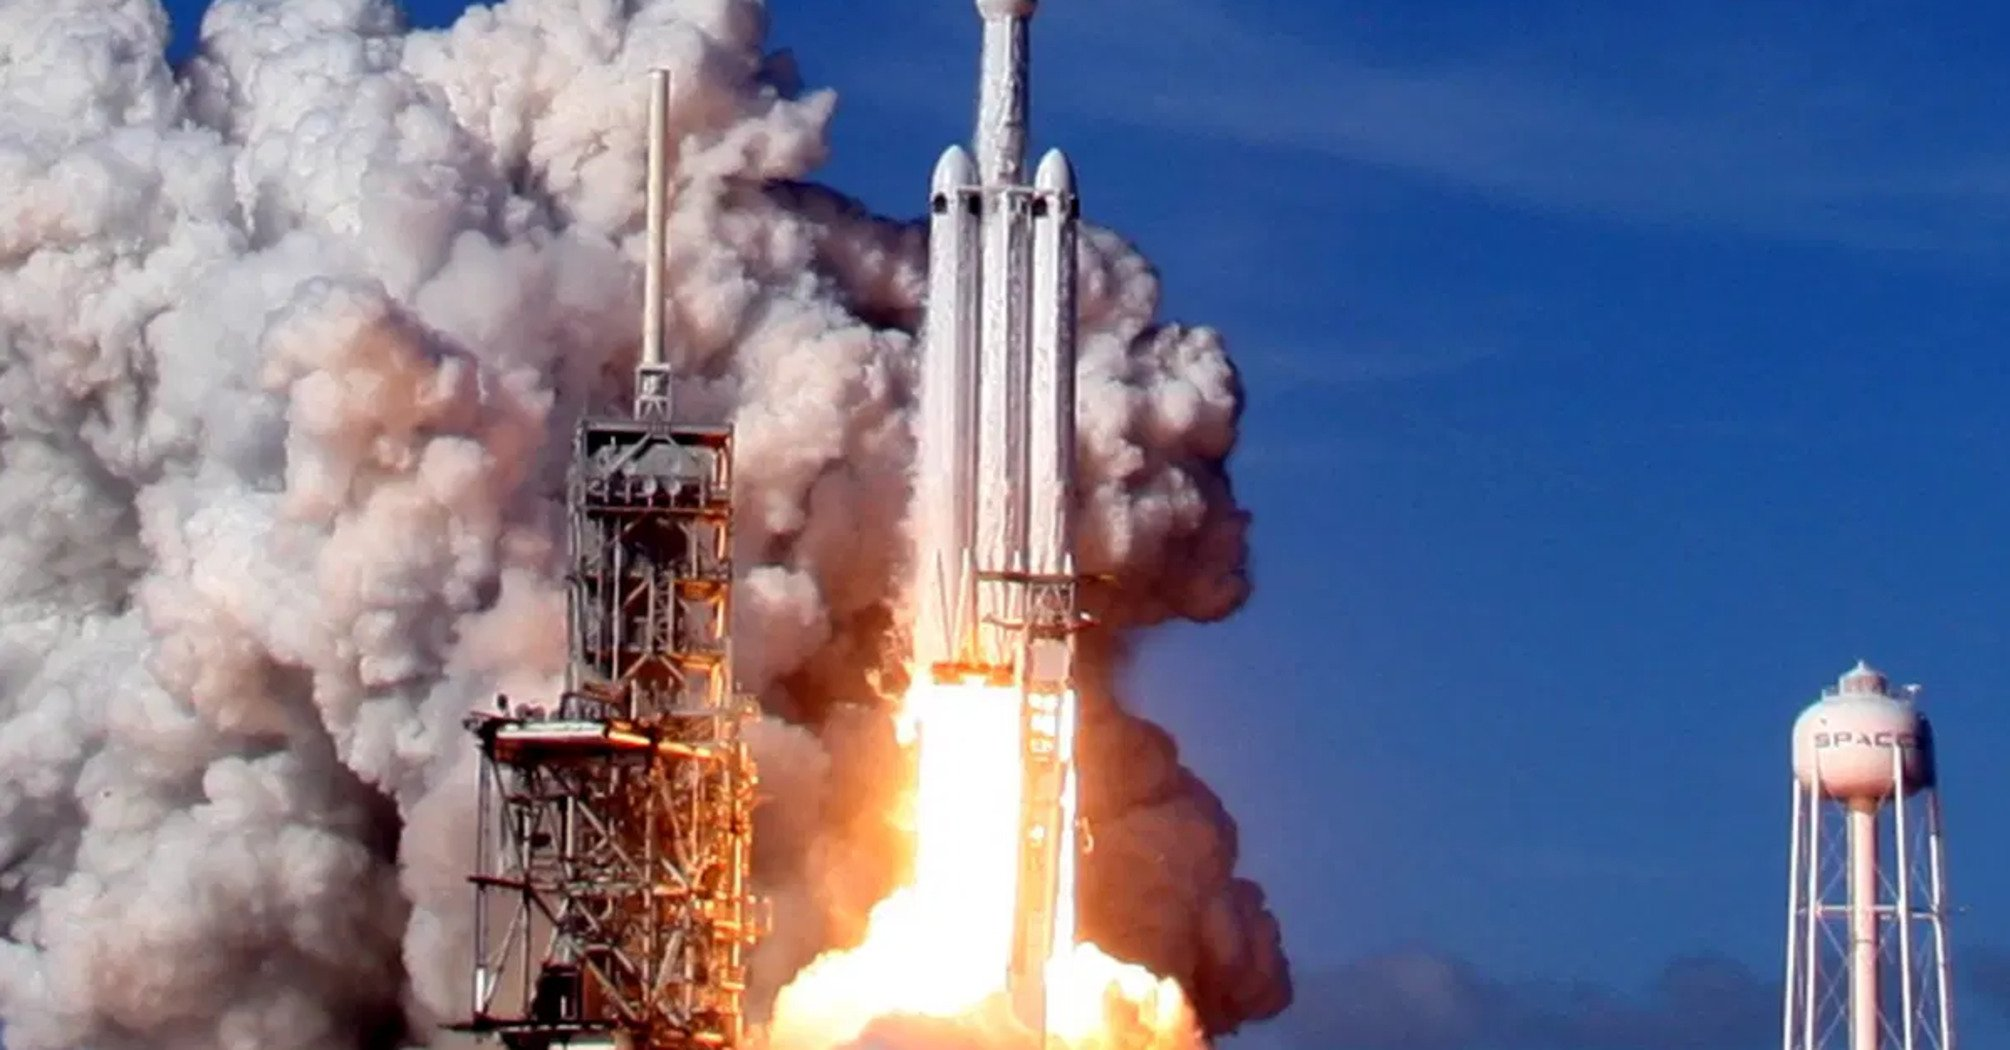 SpaceX запустила очередную ракету со спутниками Starlink. Яркое видео